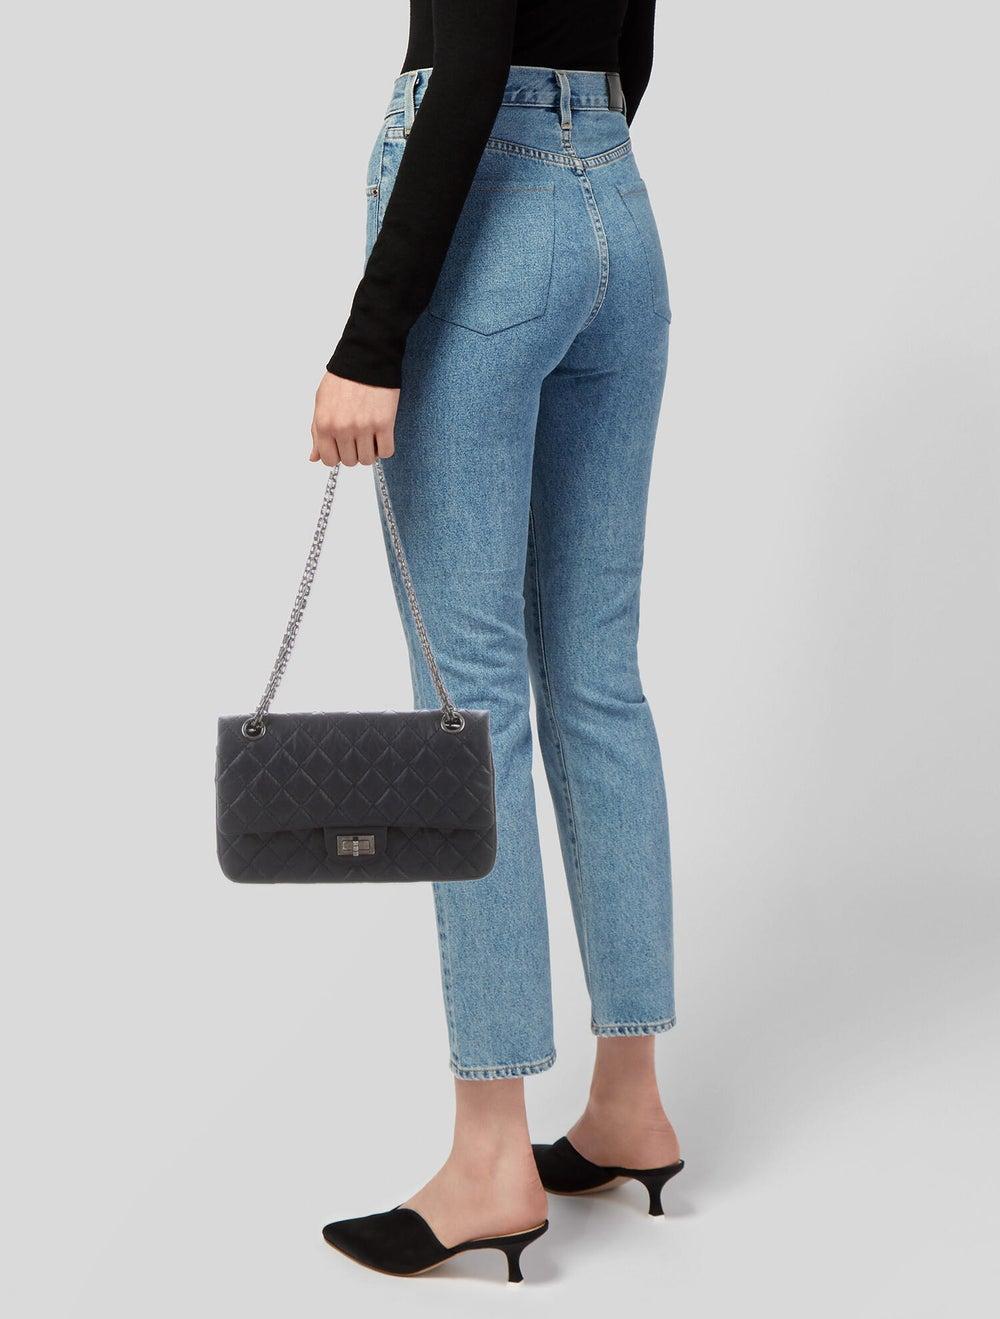 Chanel Reissue 225 Double Flap Bag Blue - image 2